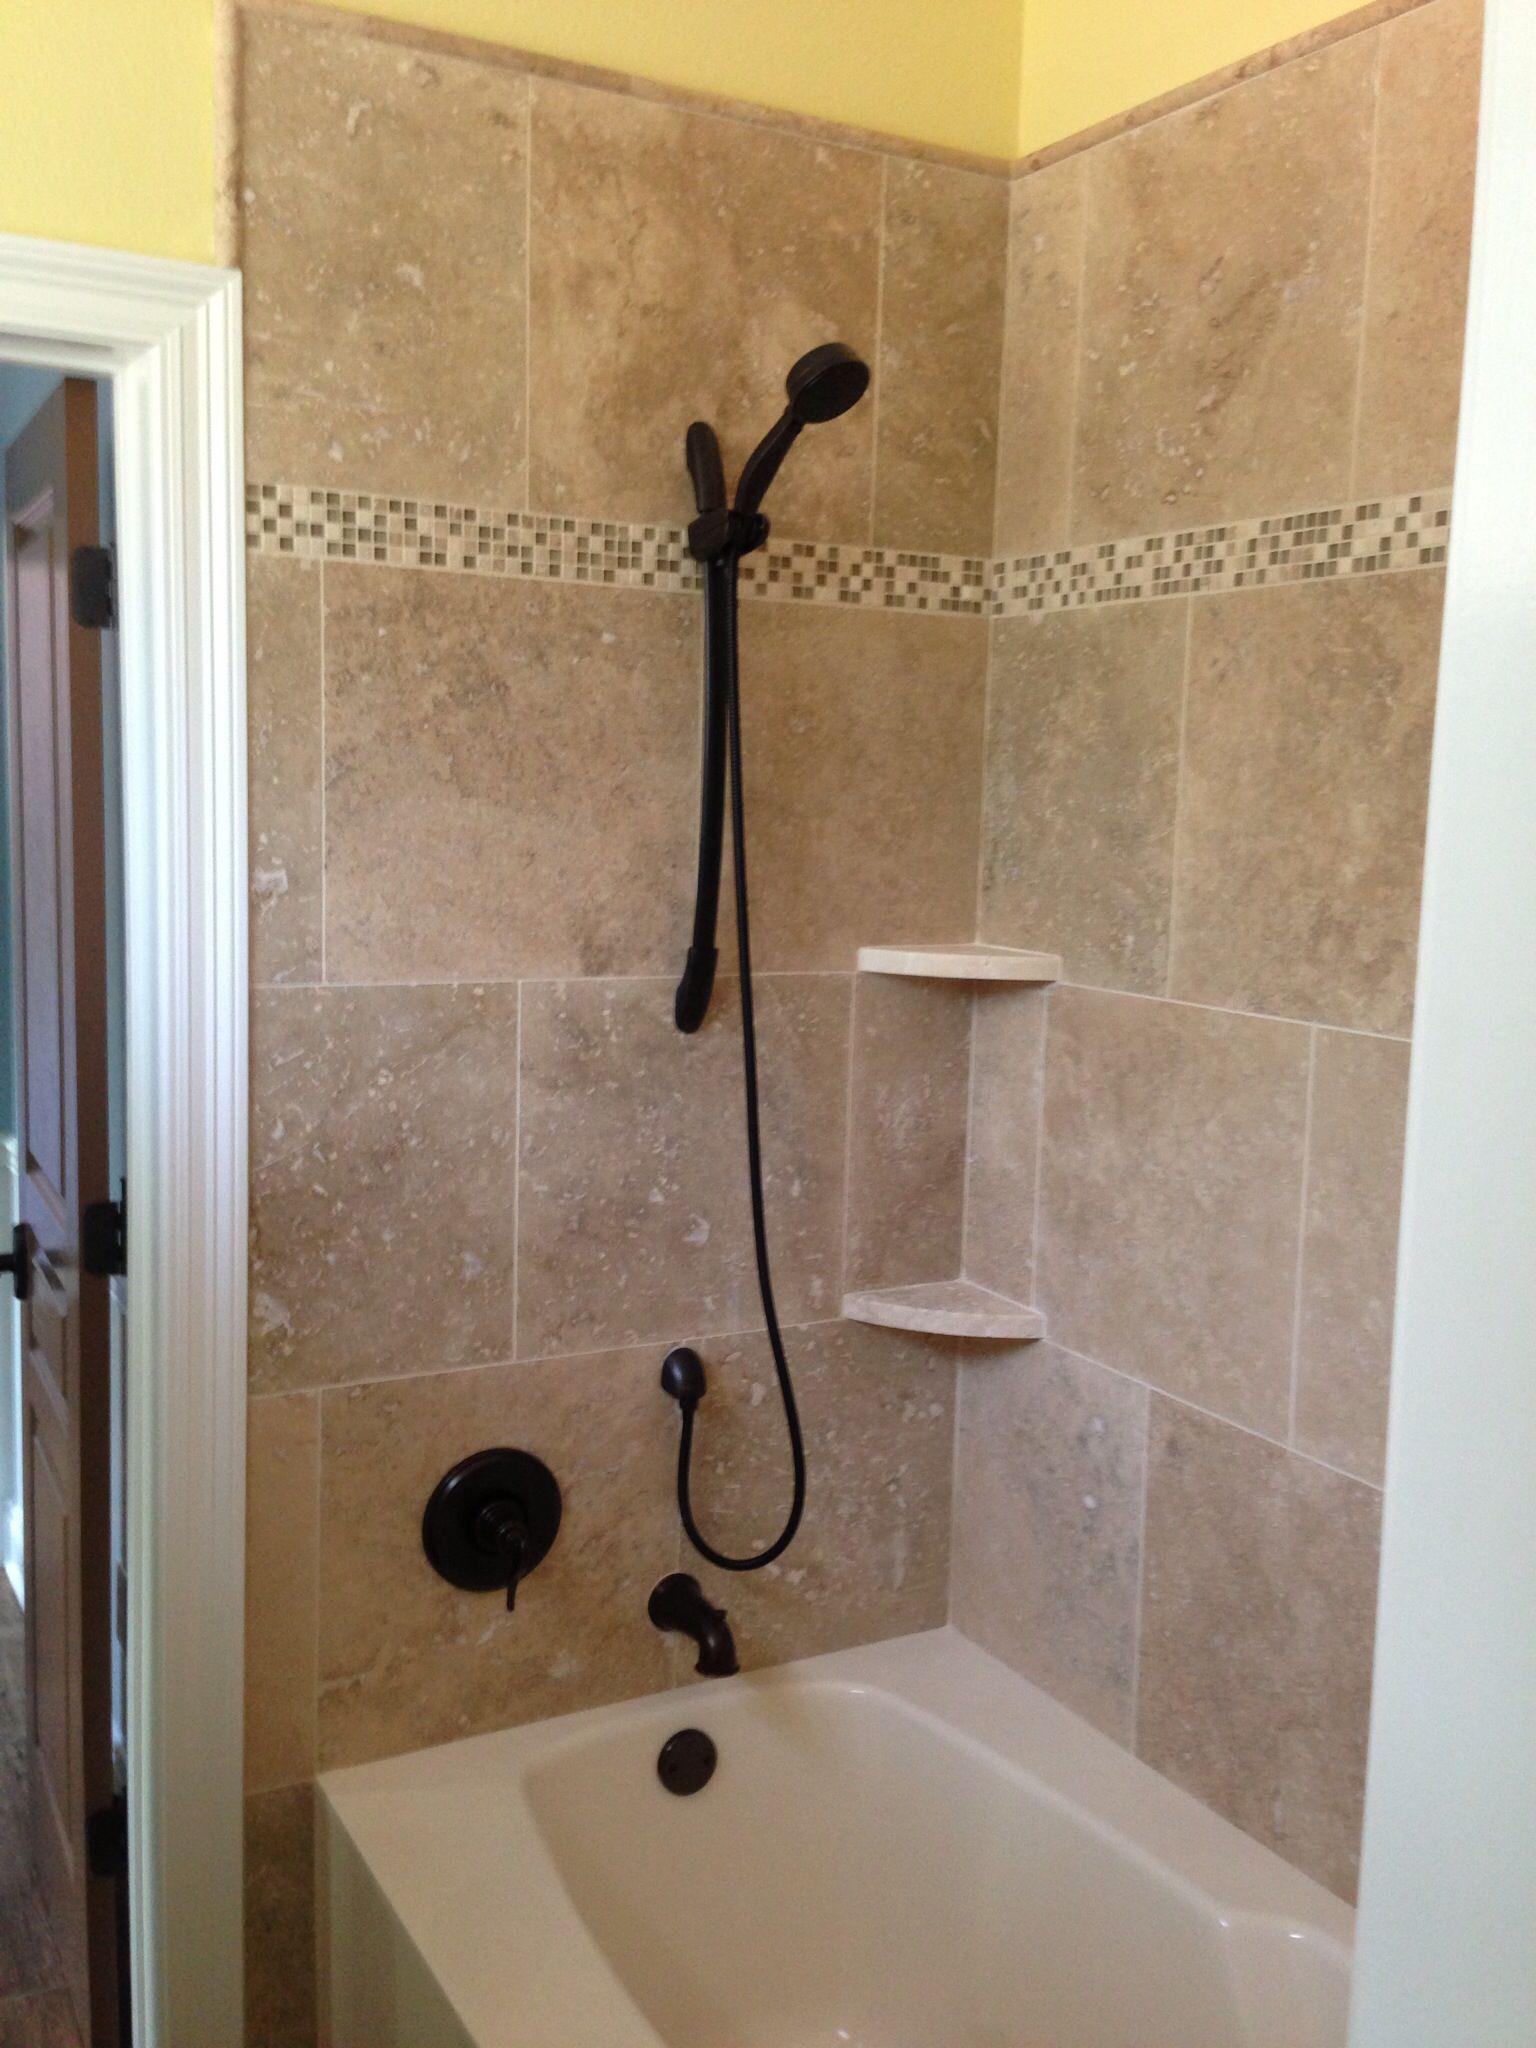 18x18 Travertine Glass Band Custom Travertine Corner Shelves Travertine Tile Bathroom Bathtub Decor Small Bathroom